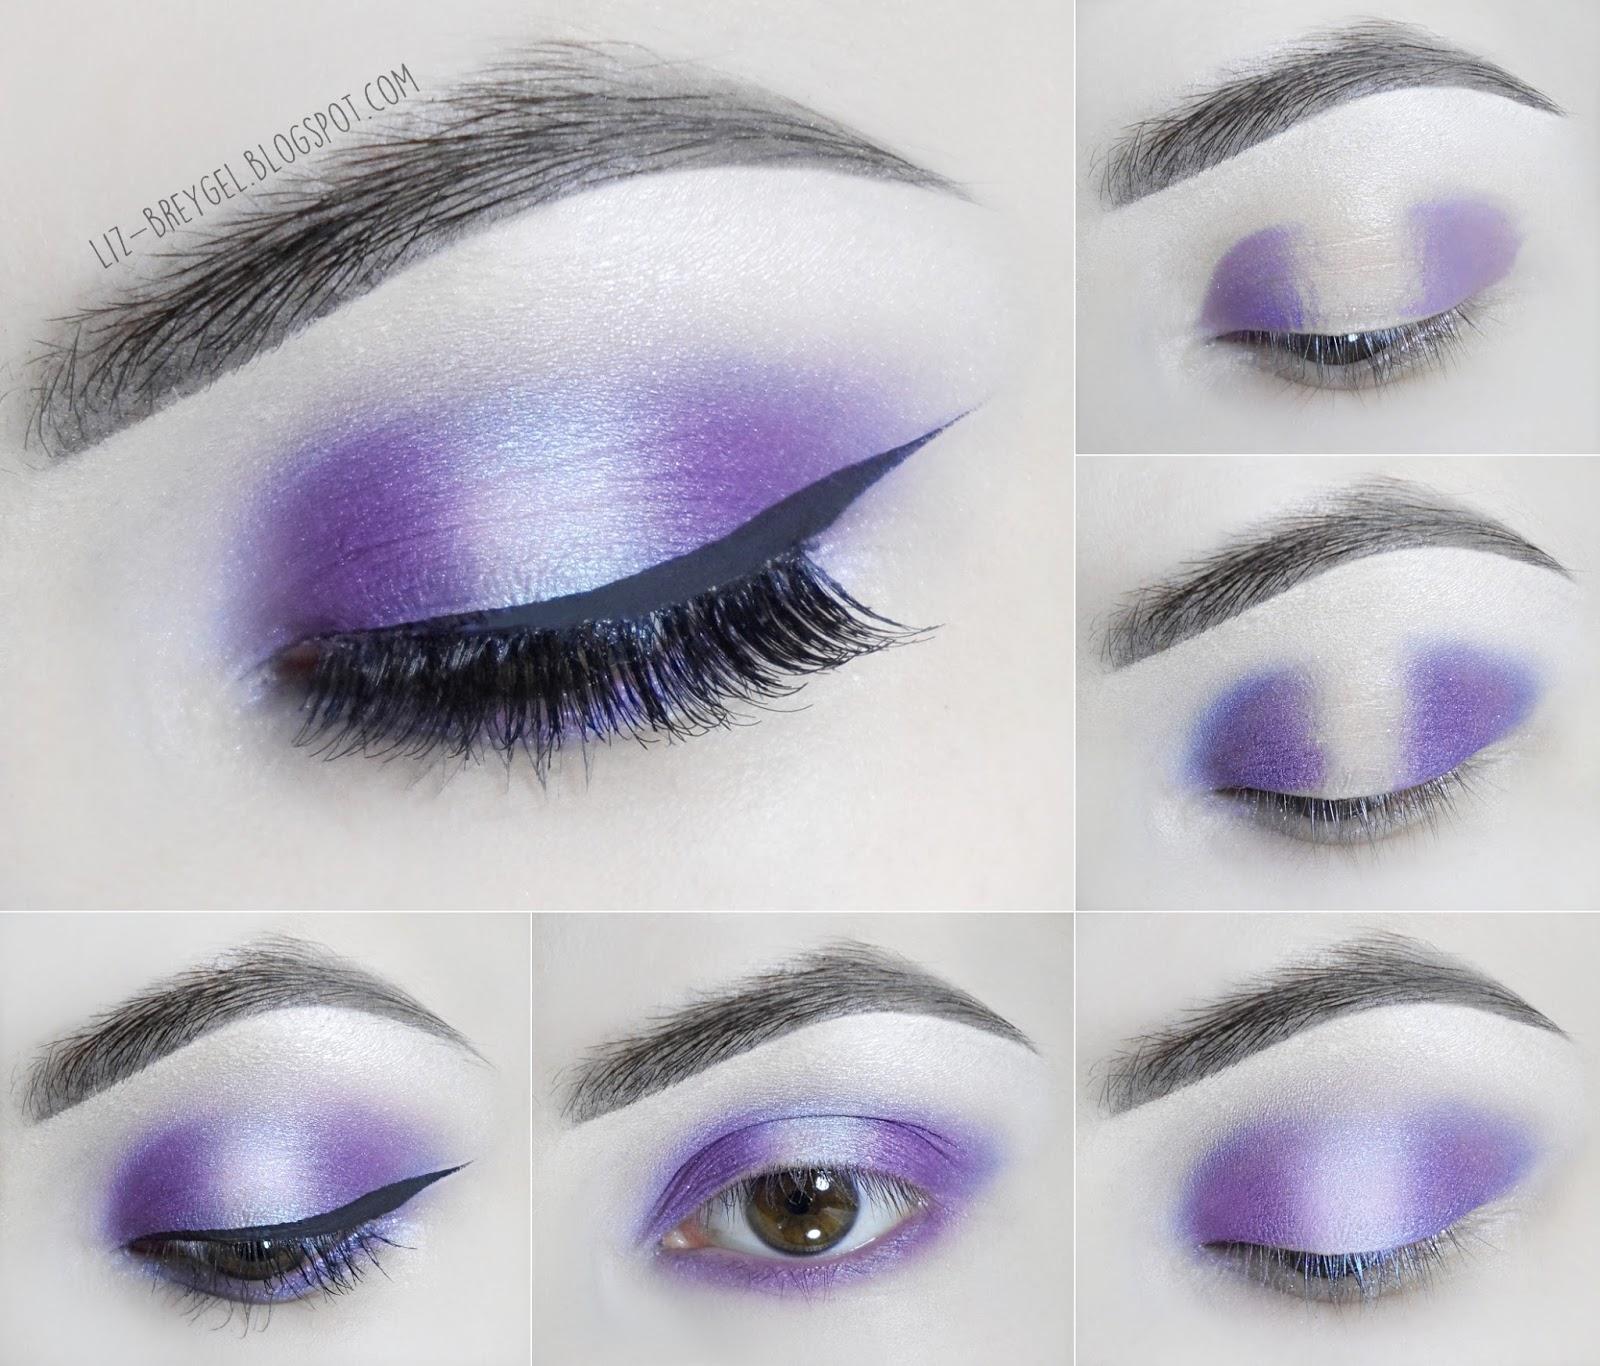 liz breygel how to Amethyst step by step Makeup Tutorial February Birthstone pictures